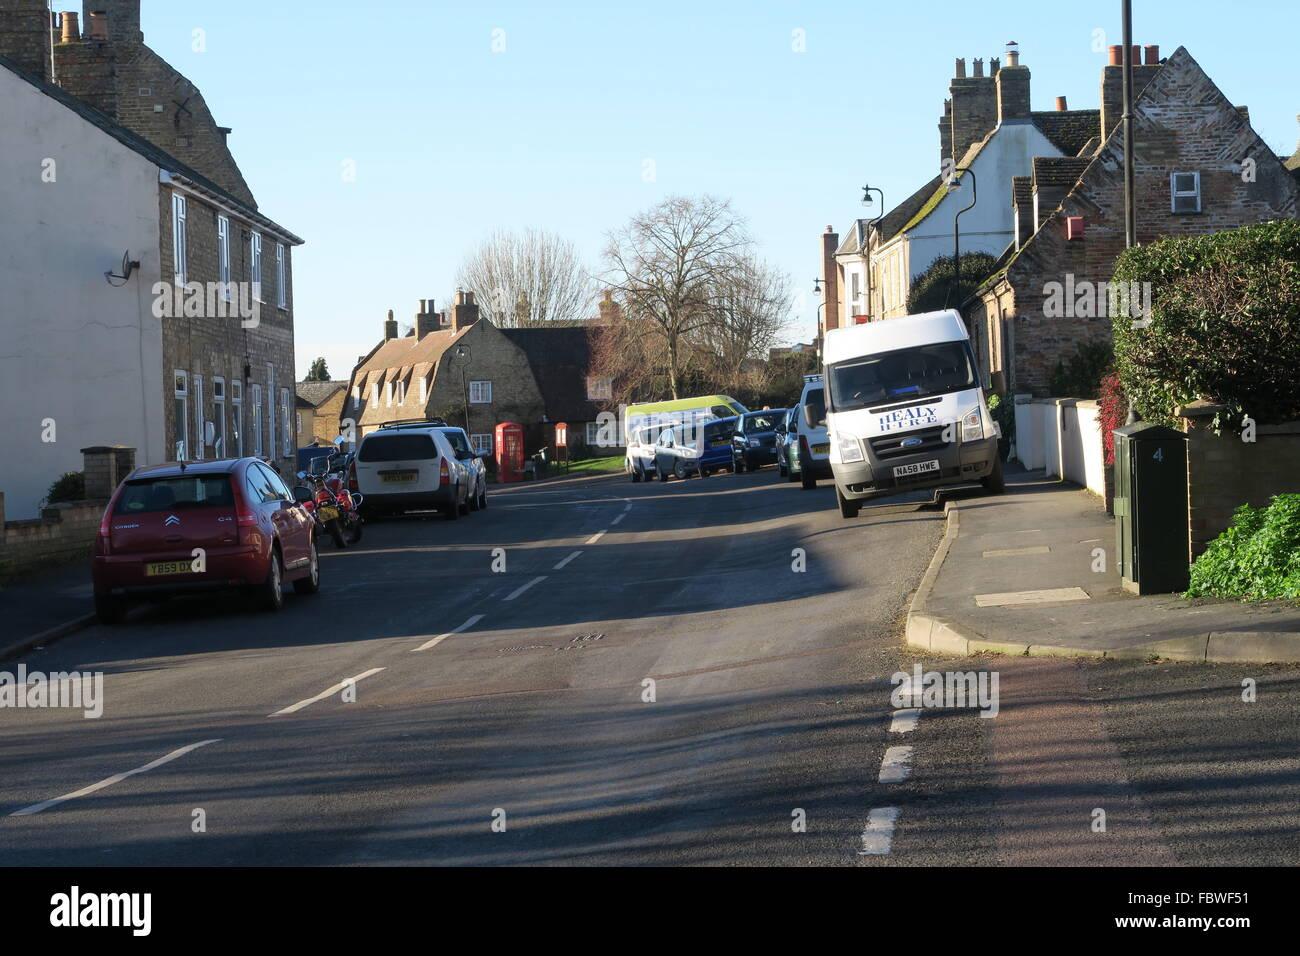 High Street, Sutton-in-the-Isle, Cambridgeshire, England Stock Photo